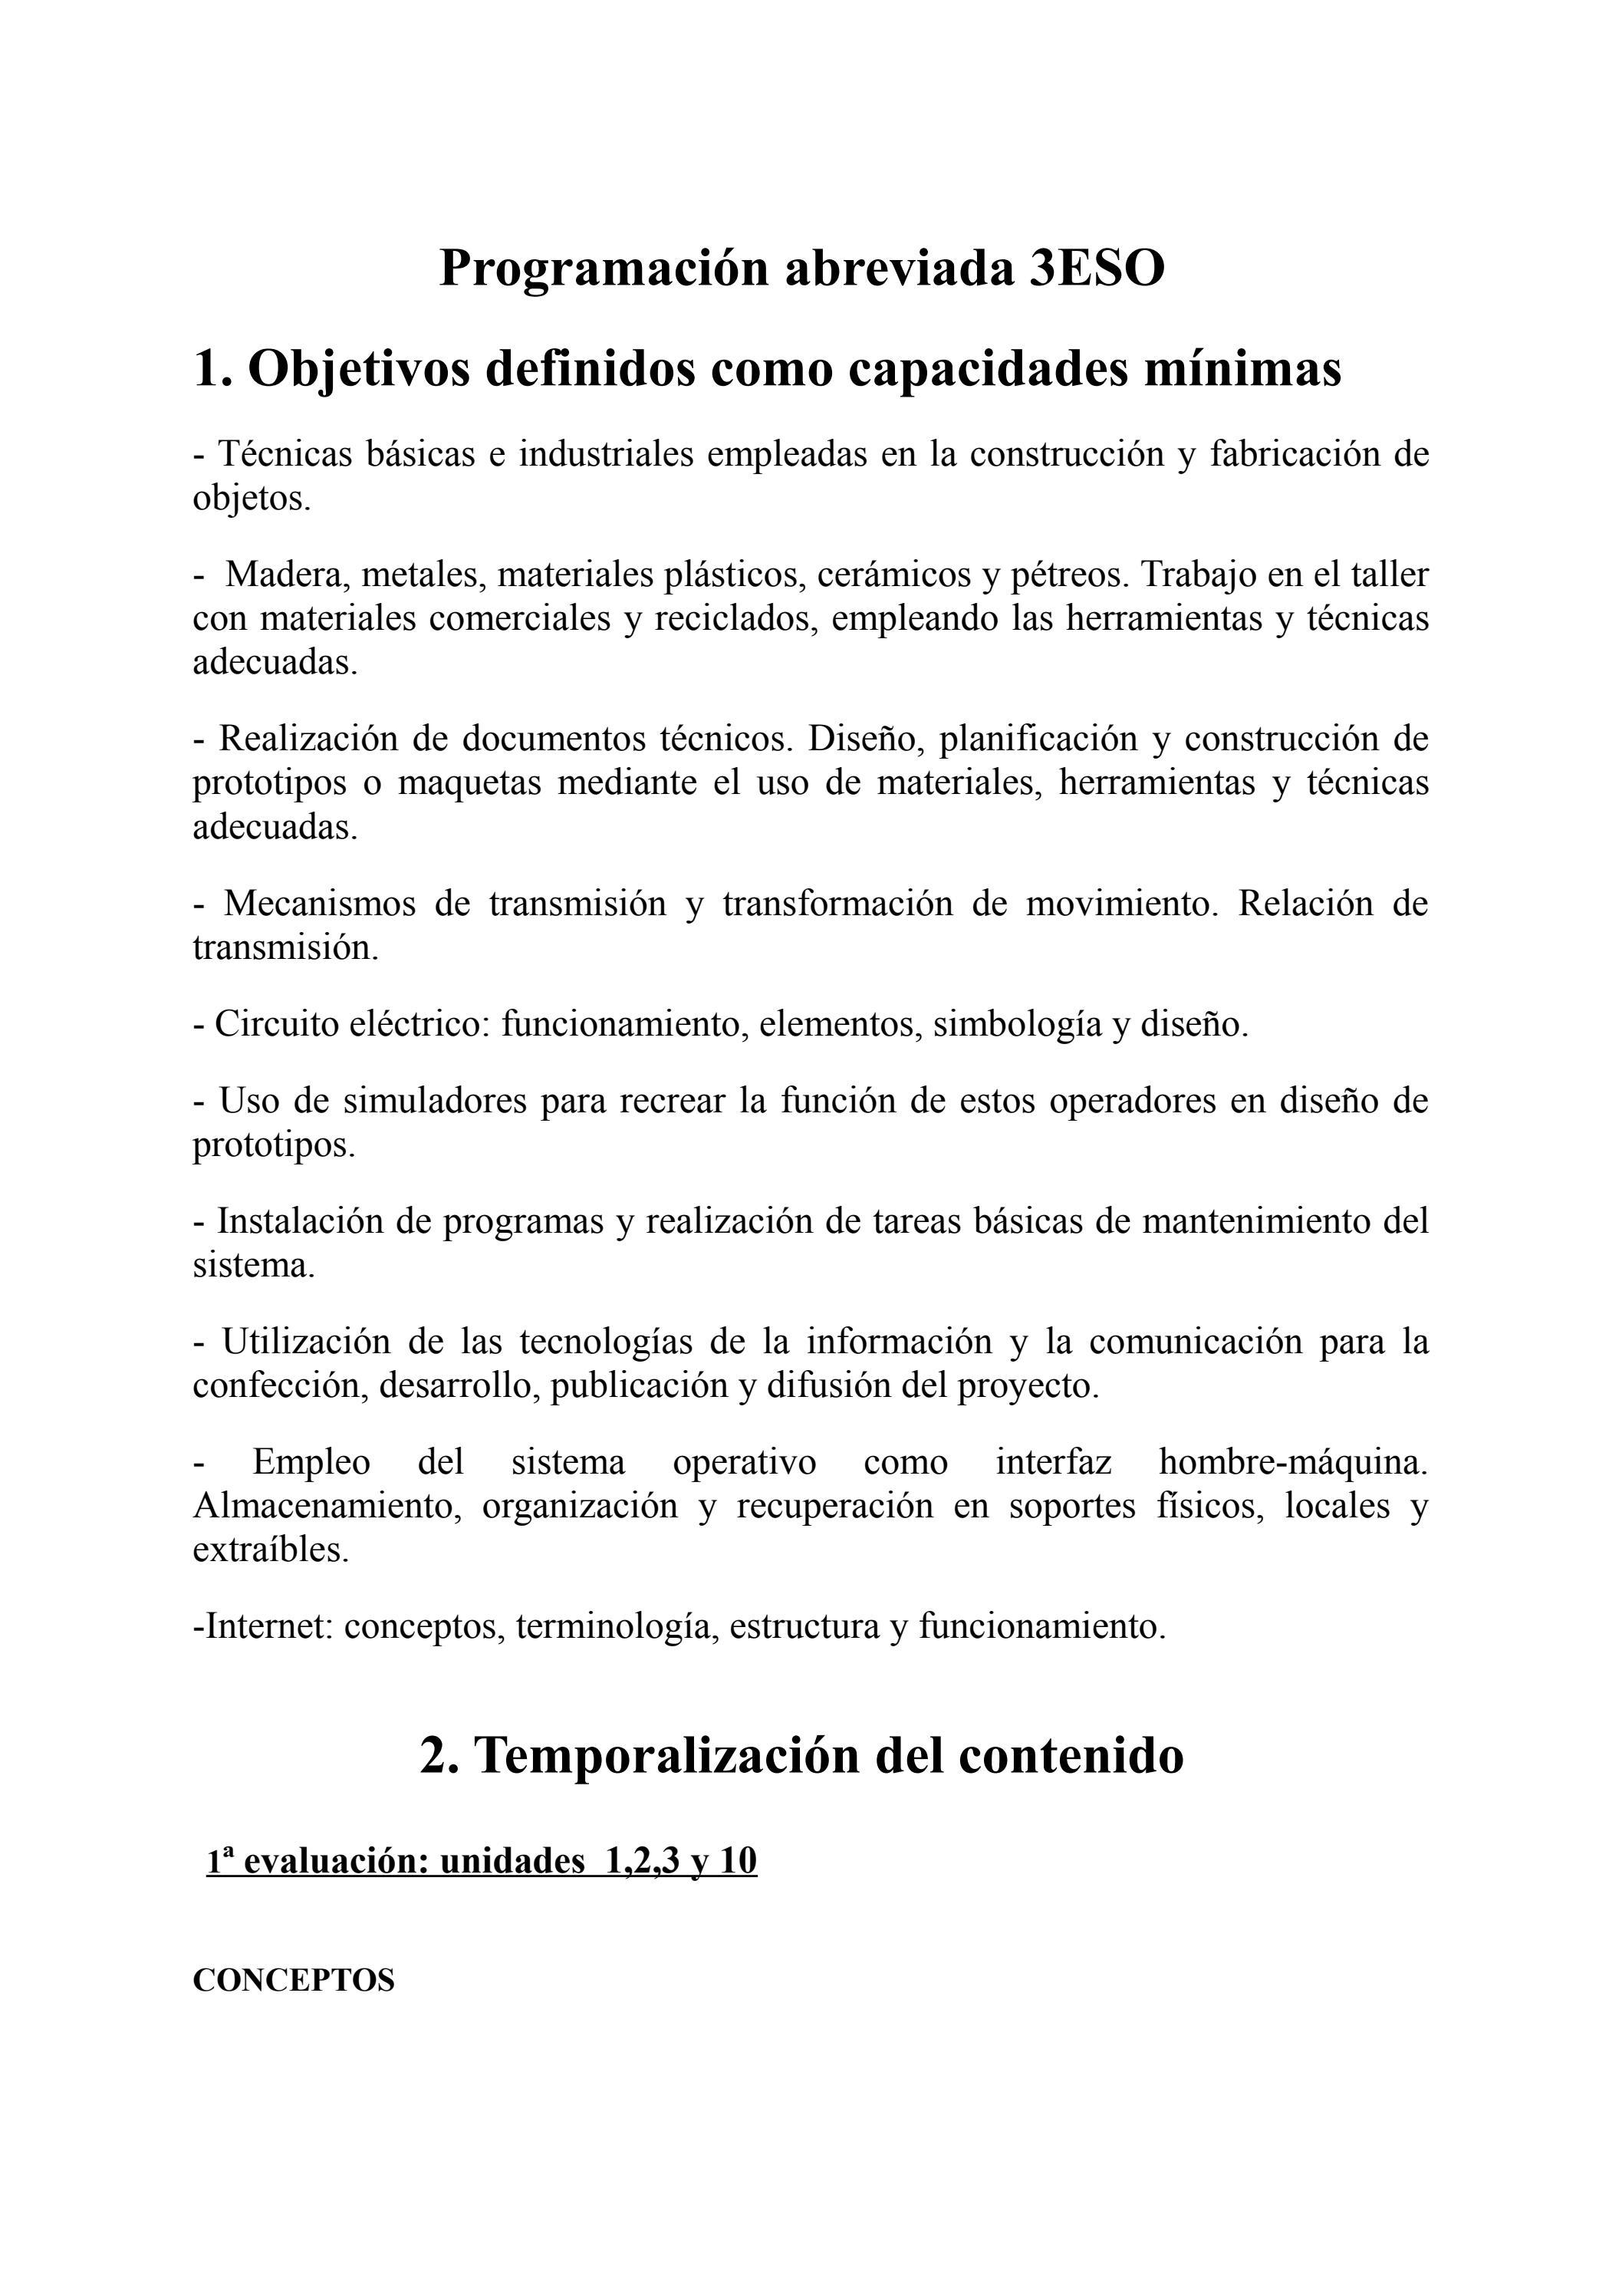 Programación abreviada by Martinez AMAIA - issuu